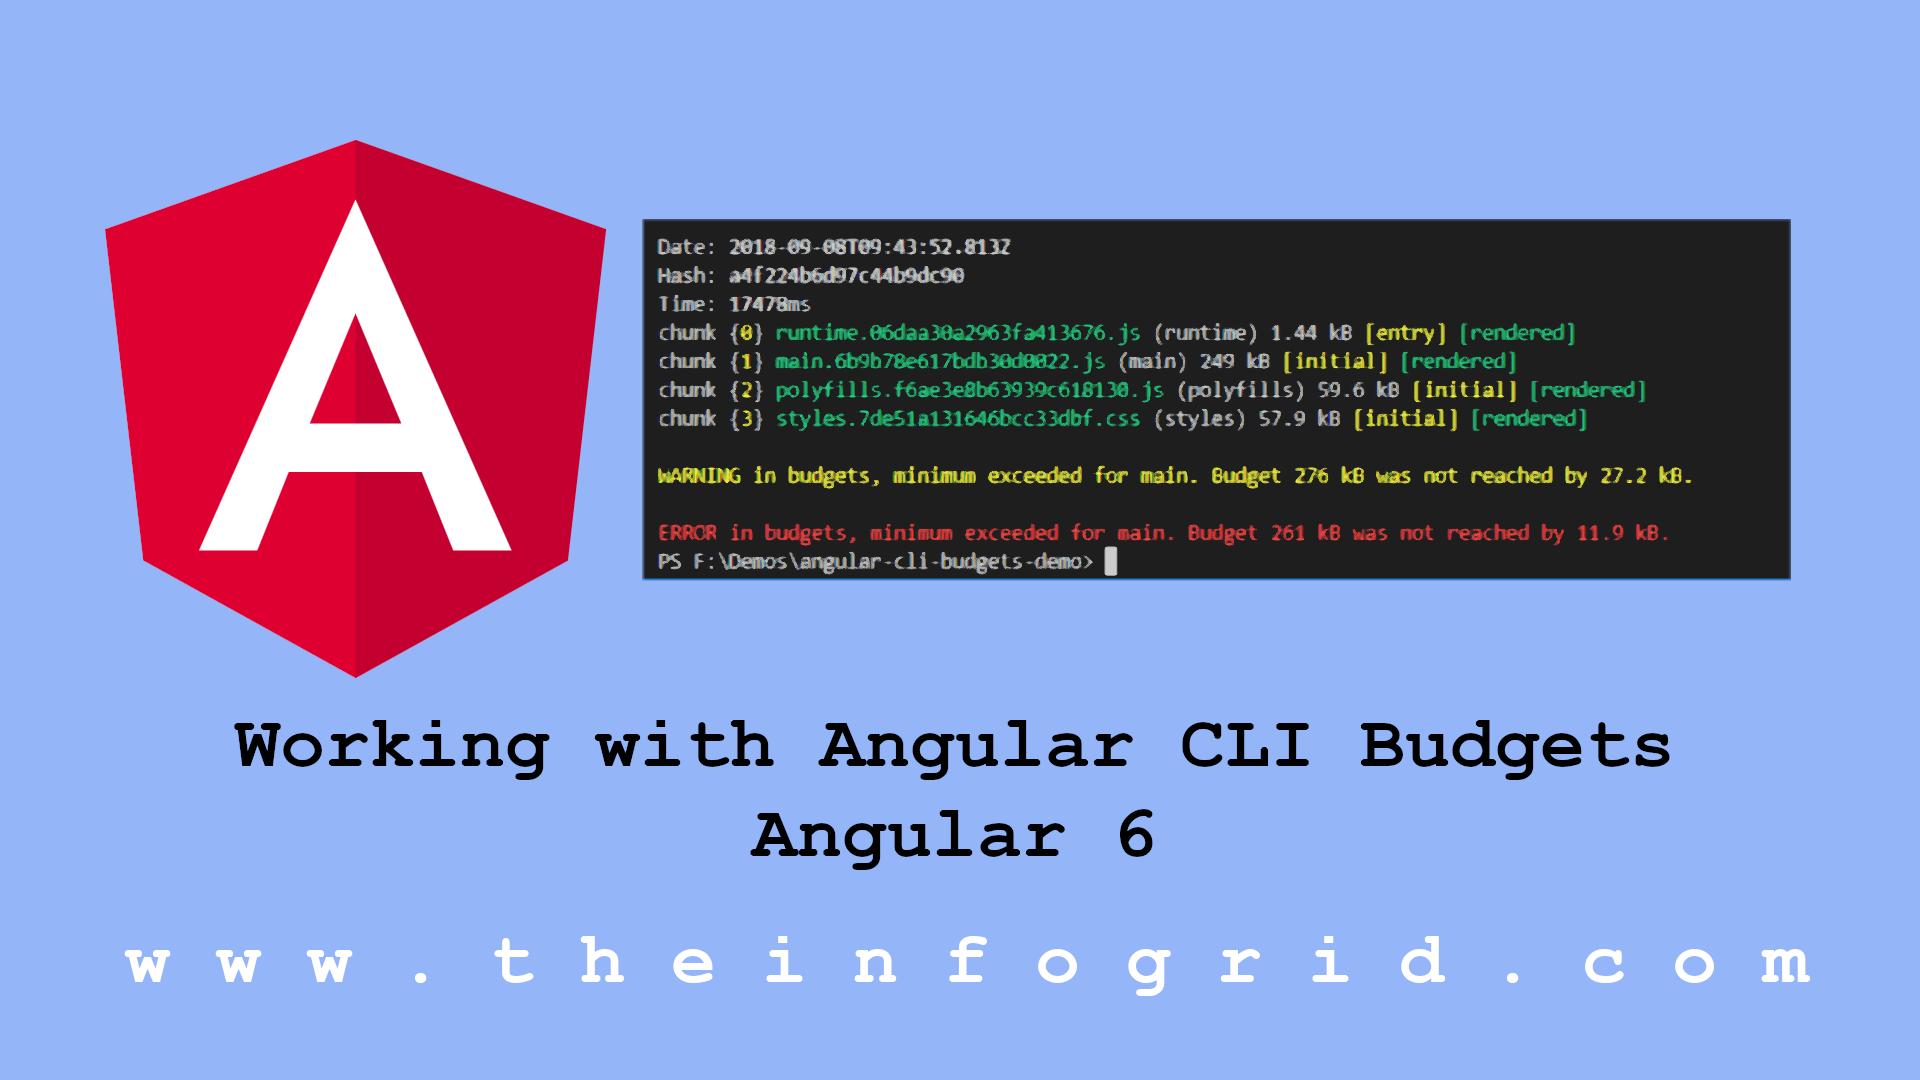 Working with Angular CLI Budgets in Angular 6